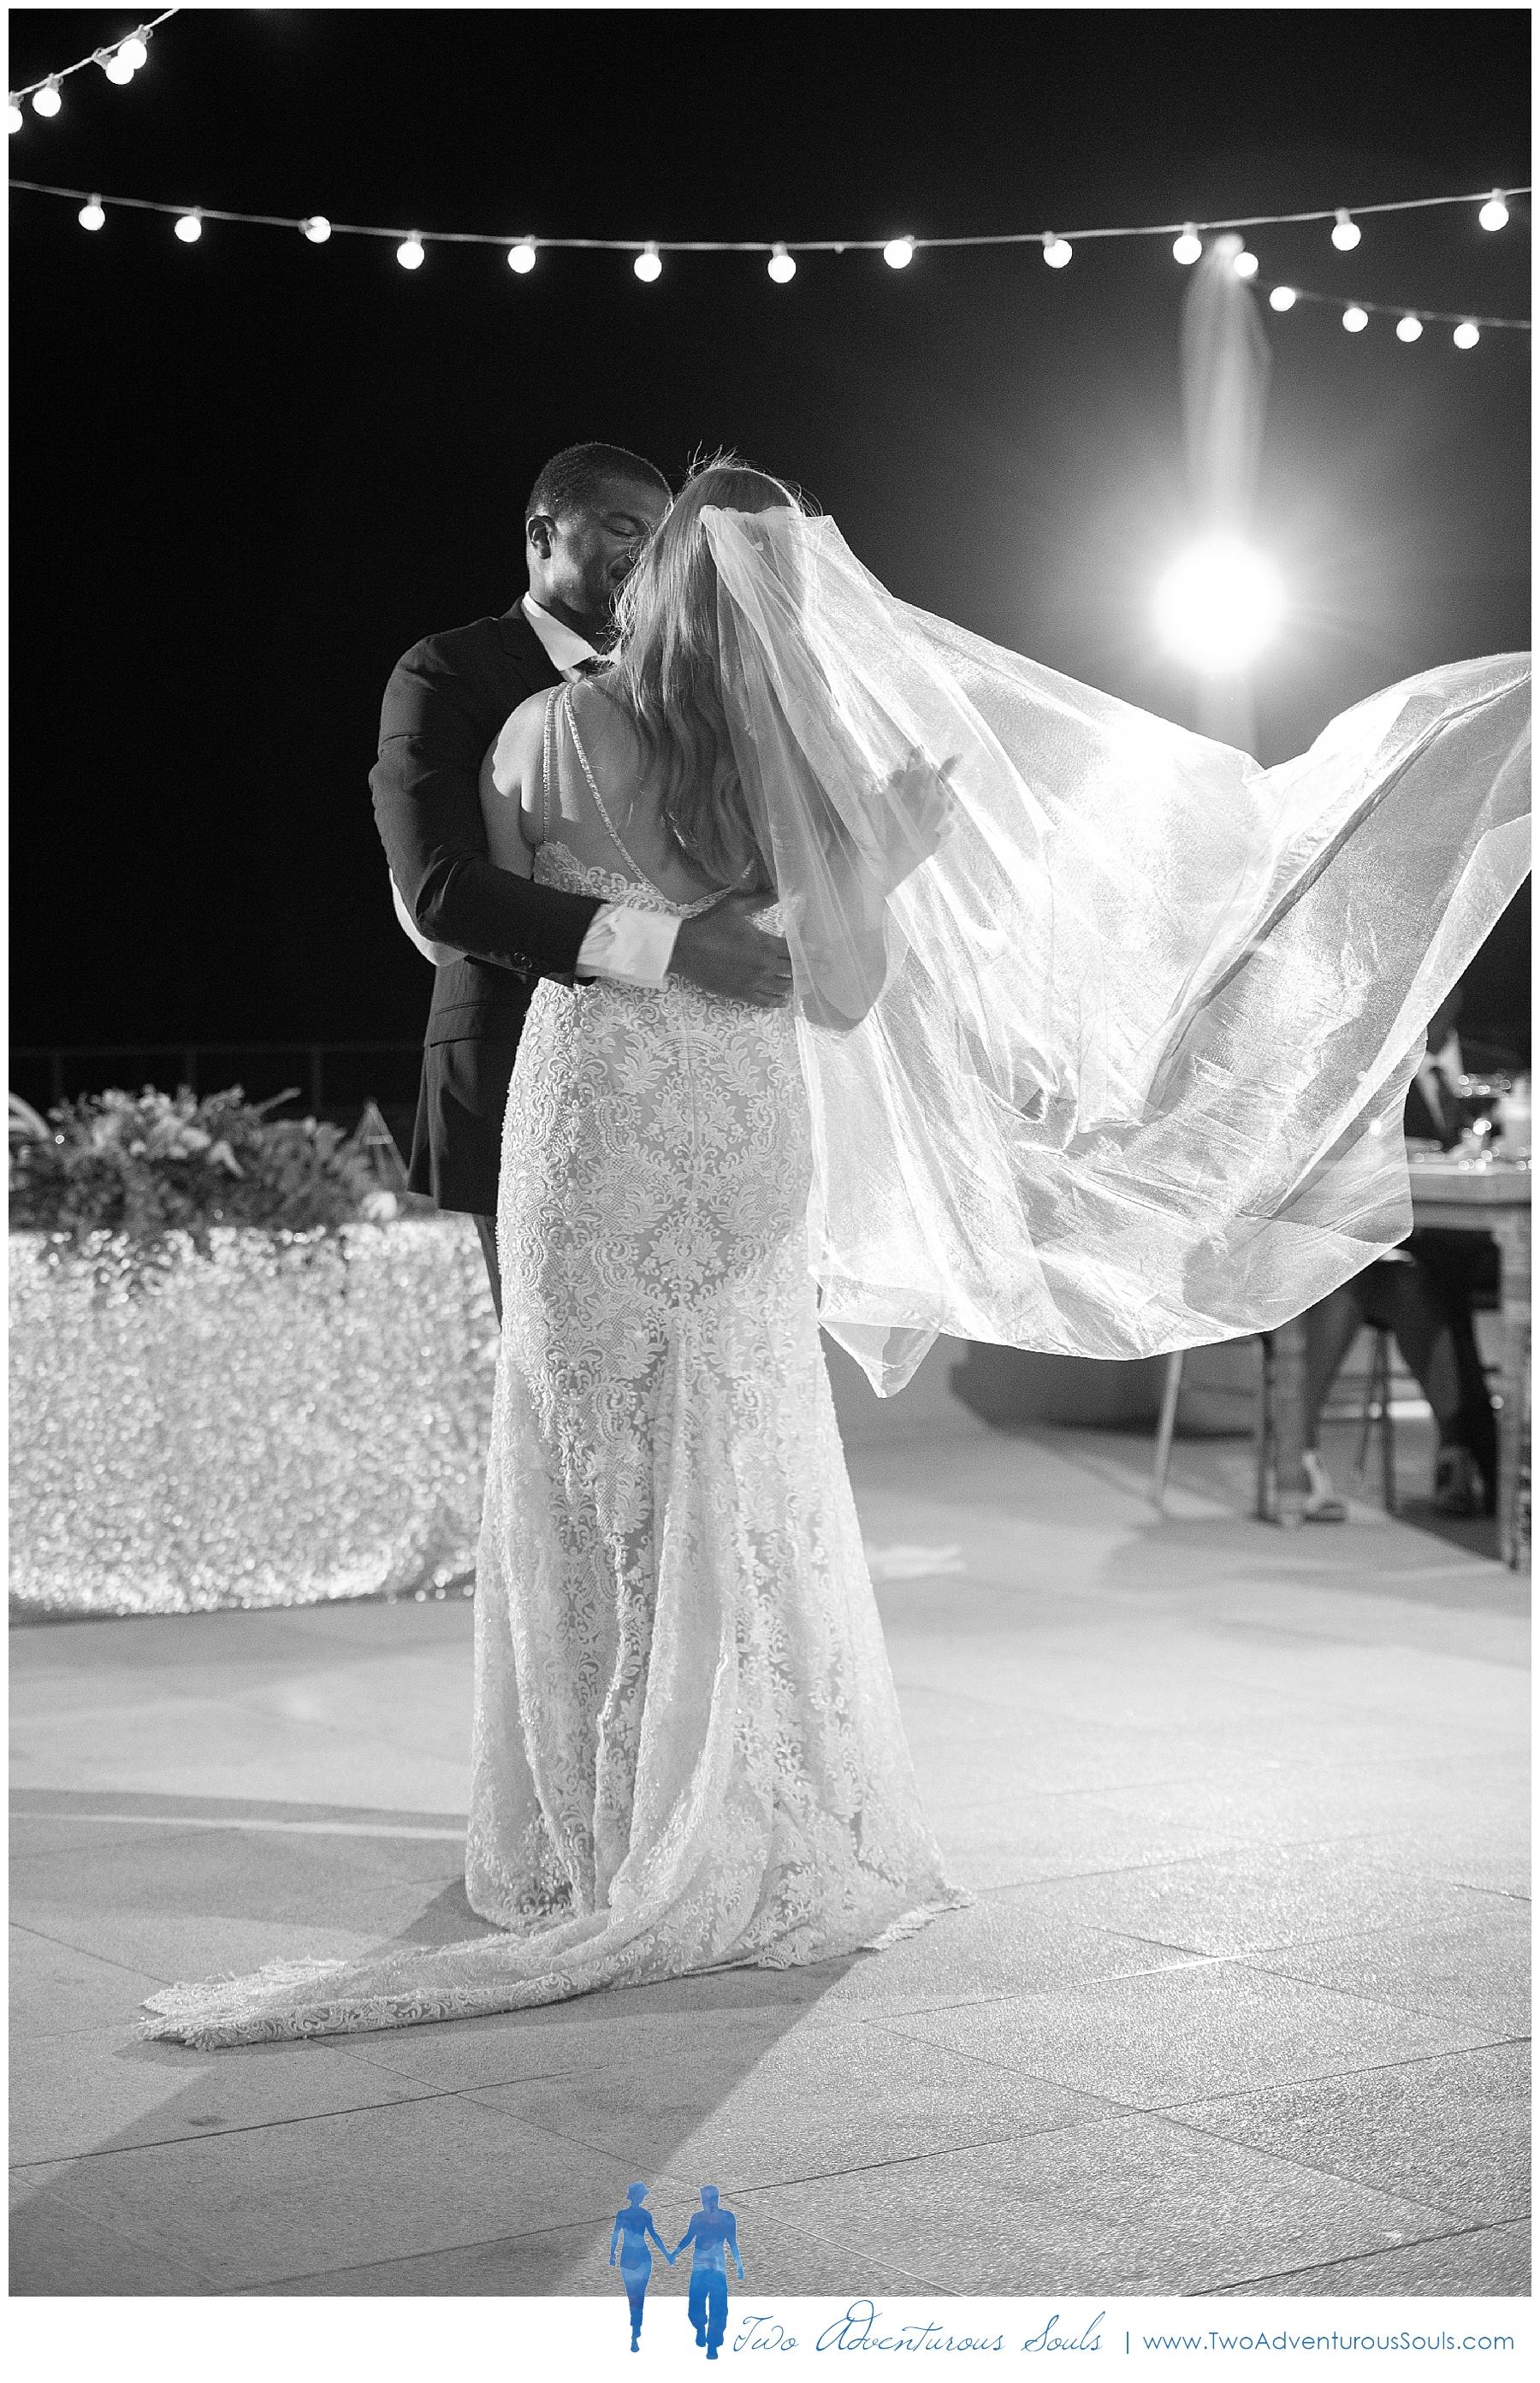 Costa Rica Wedding Photographers, Dreams las Mareas Wedding, Destination Wedding Photographers, Two Adventurous Souls - 022219_0043.jpg